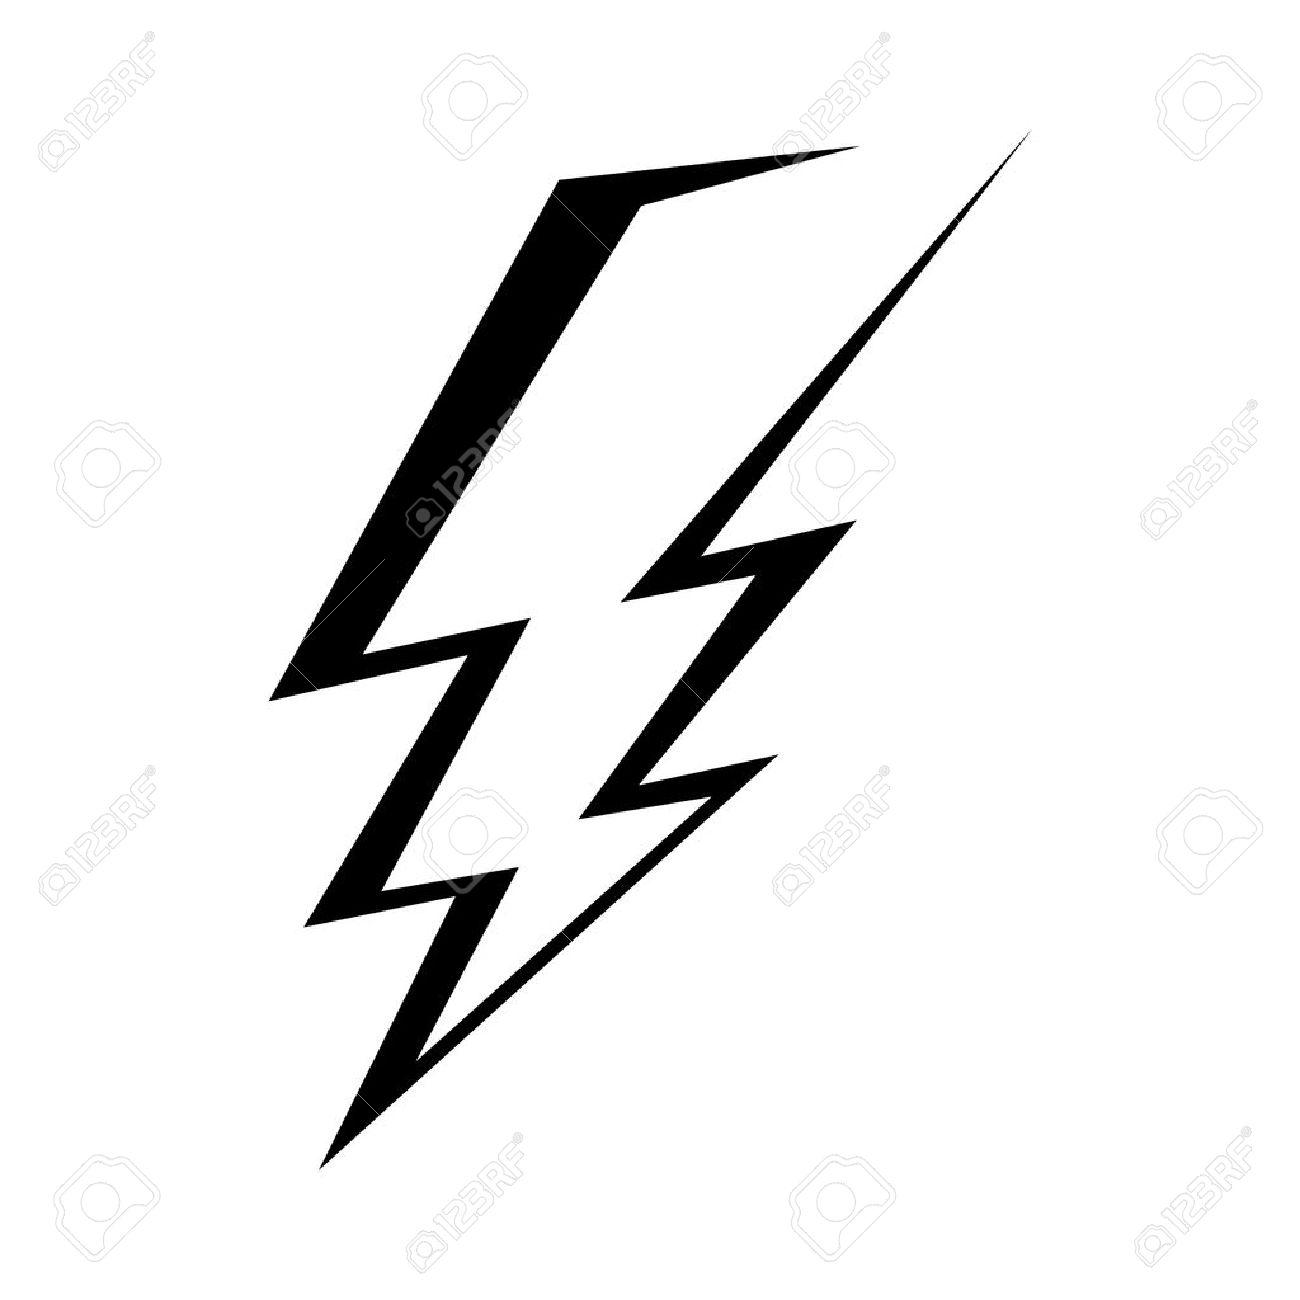 lightning bolt vector icon royalty free cliparts vectors and stock rh 123rf com lightning bolt vector image lightning bolt vector art